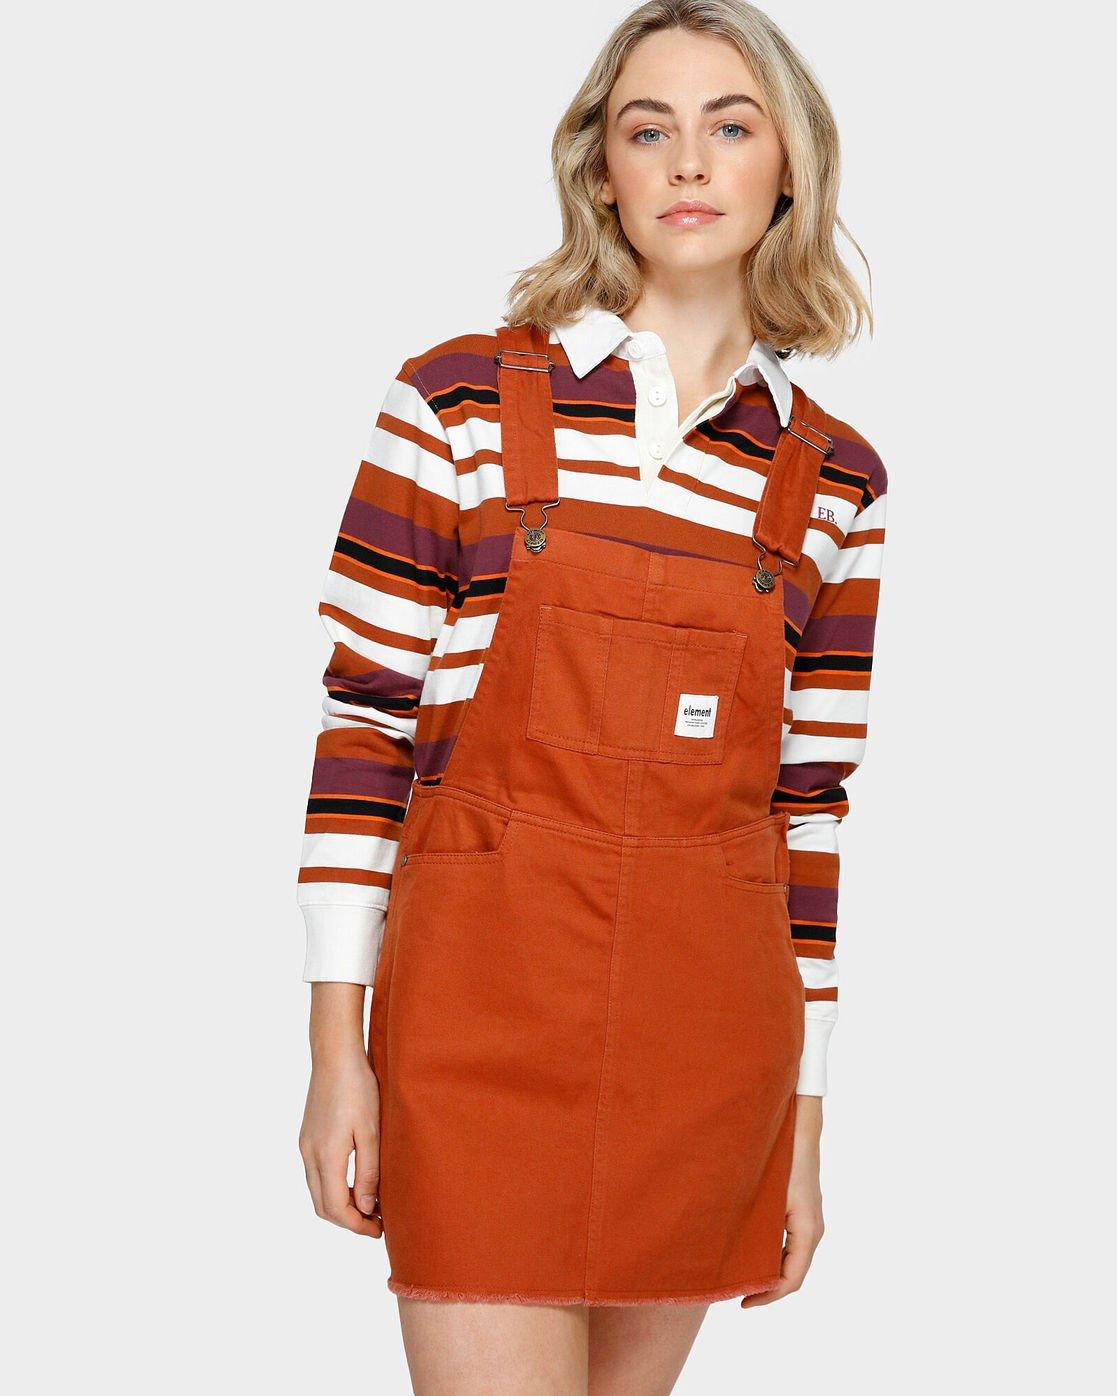 0 OLIVIA PINAFORE DRESS Orange 293869 Element